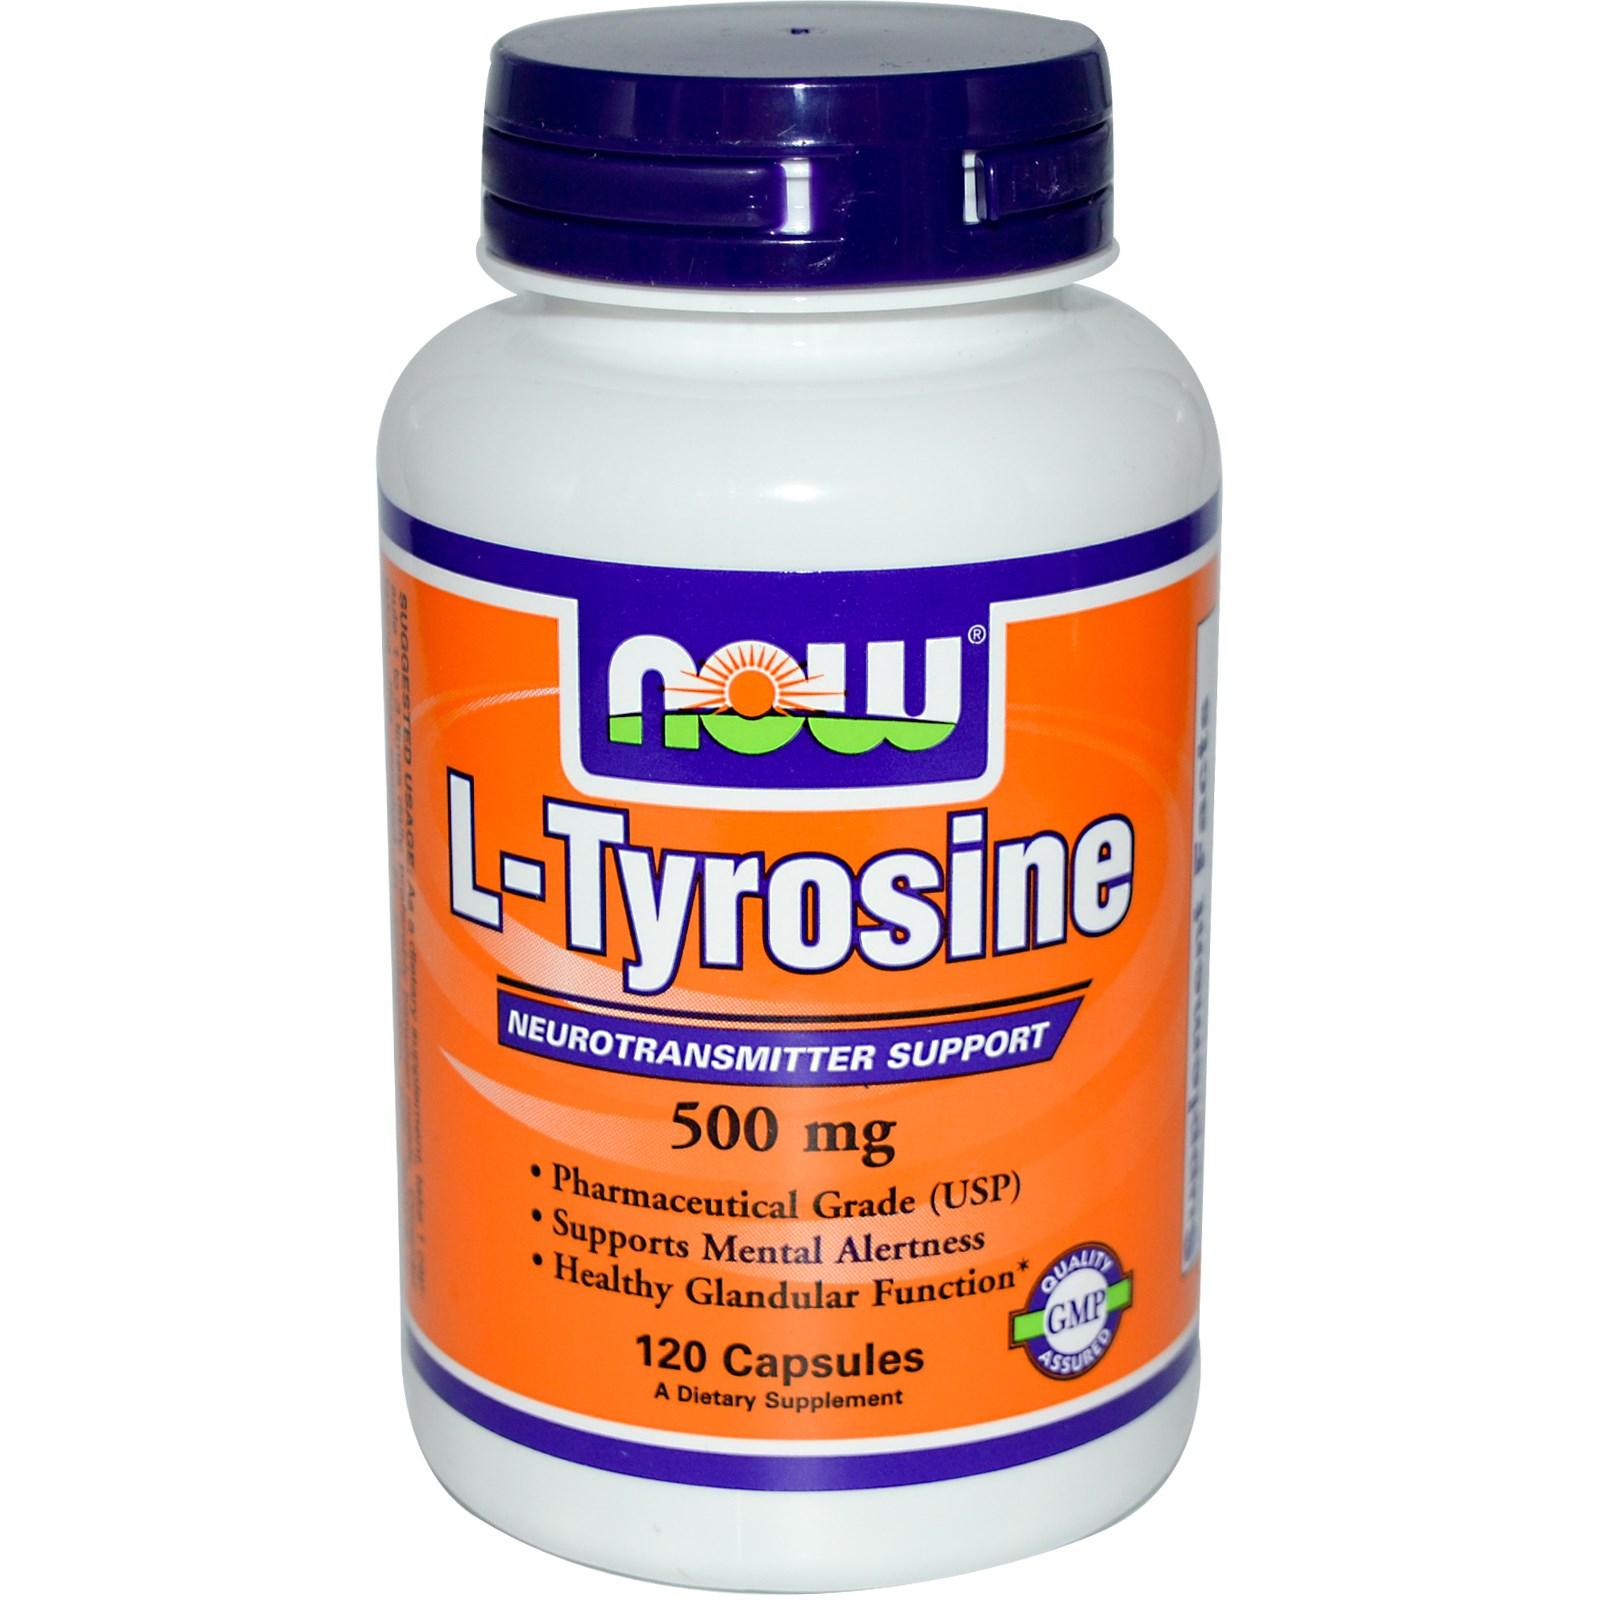 Image of Now Foods, L-Tyrosine, 500 mg, 120 Capsules 0733739001627